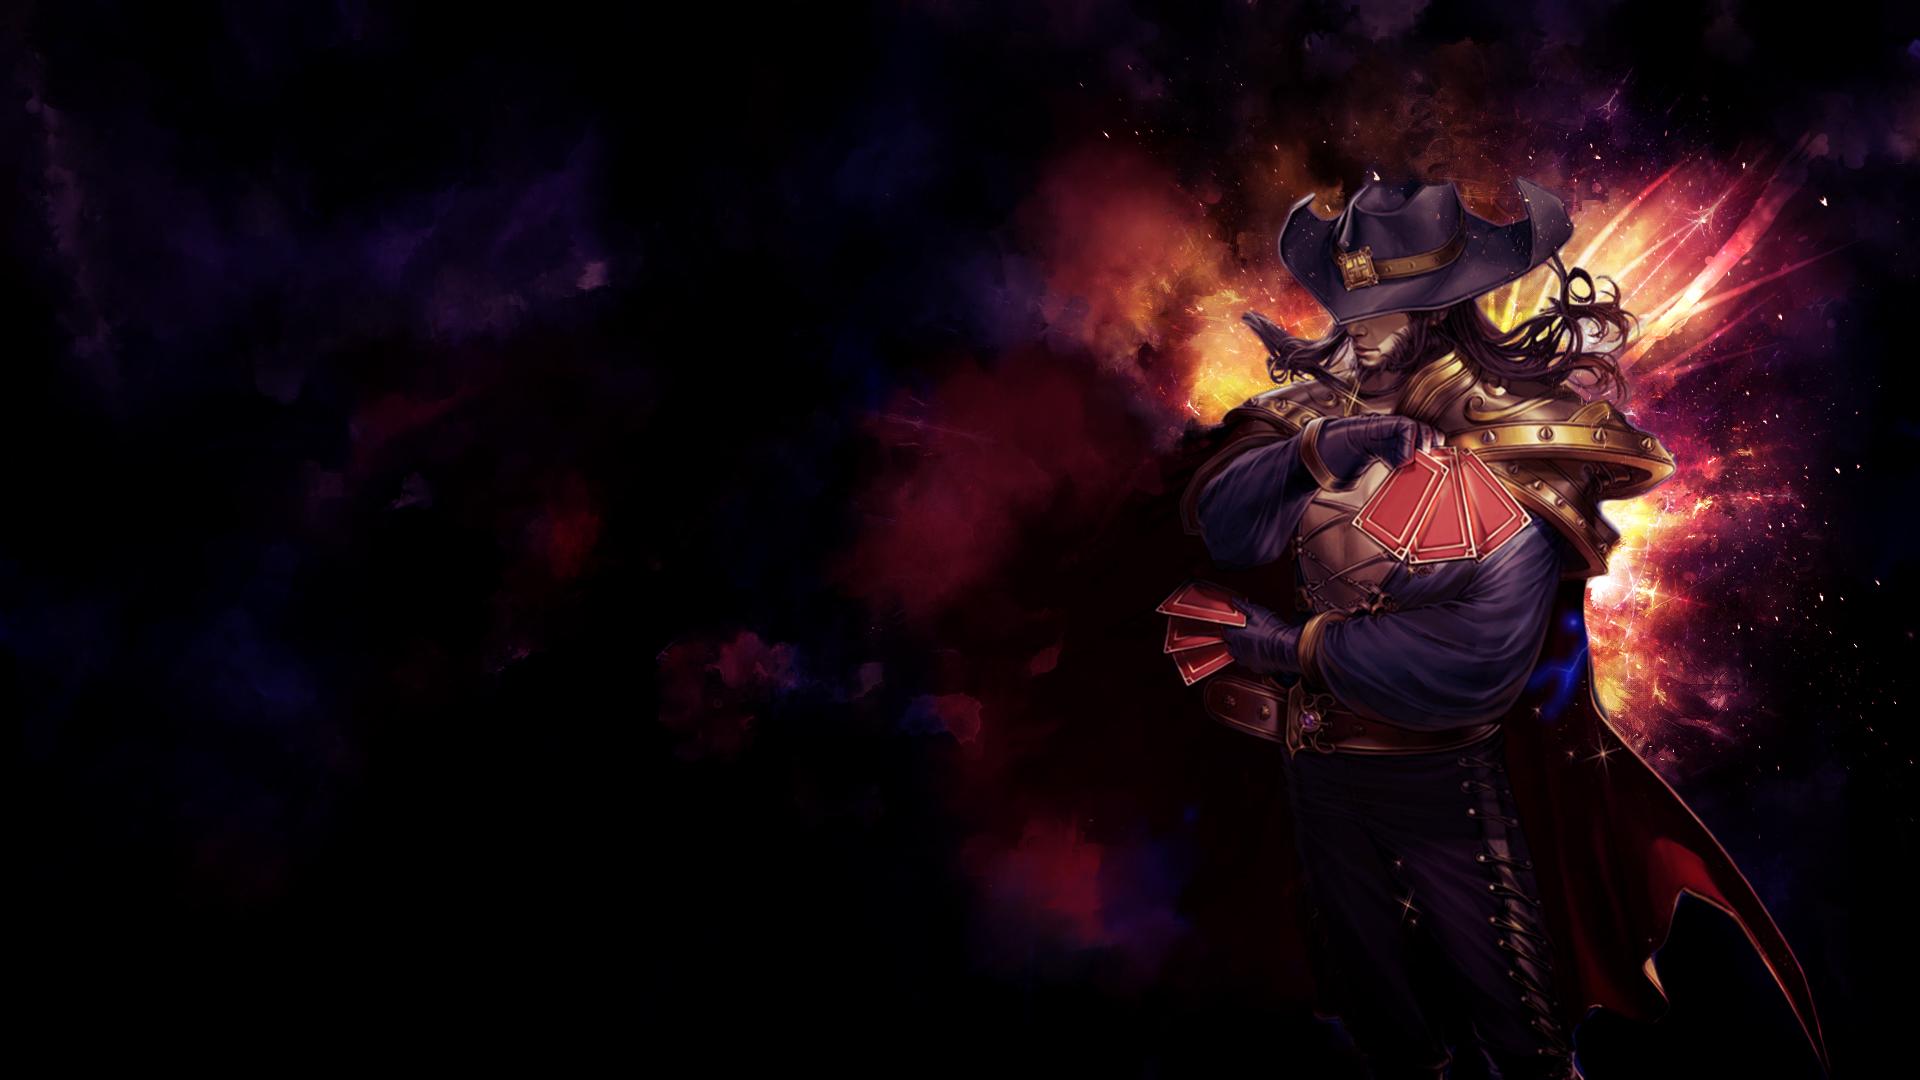 Free Download Twisted Fate Fan Art League Of Legends Wallpapers